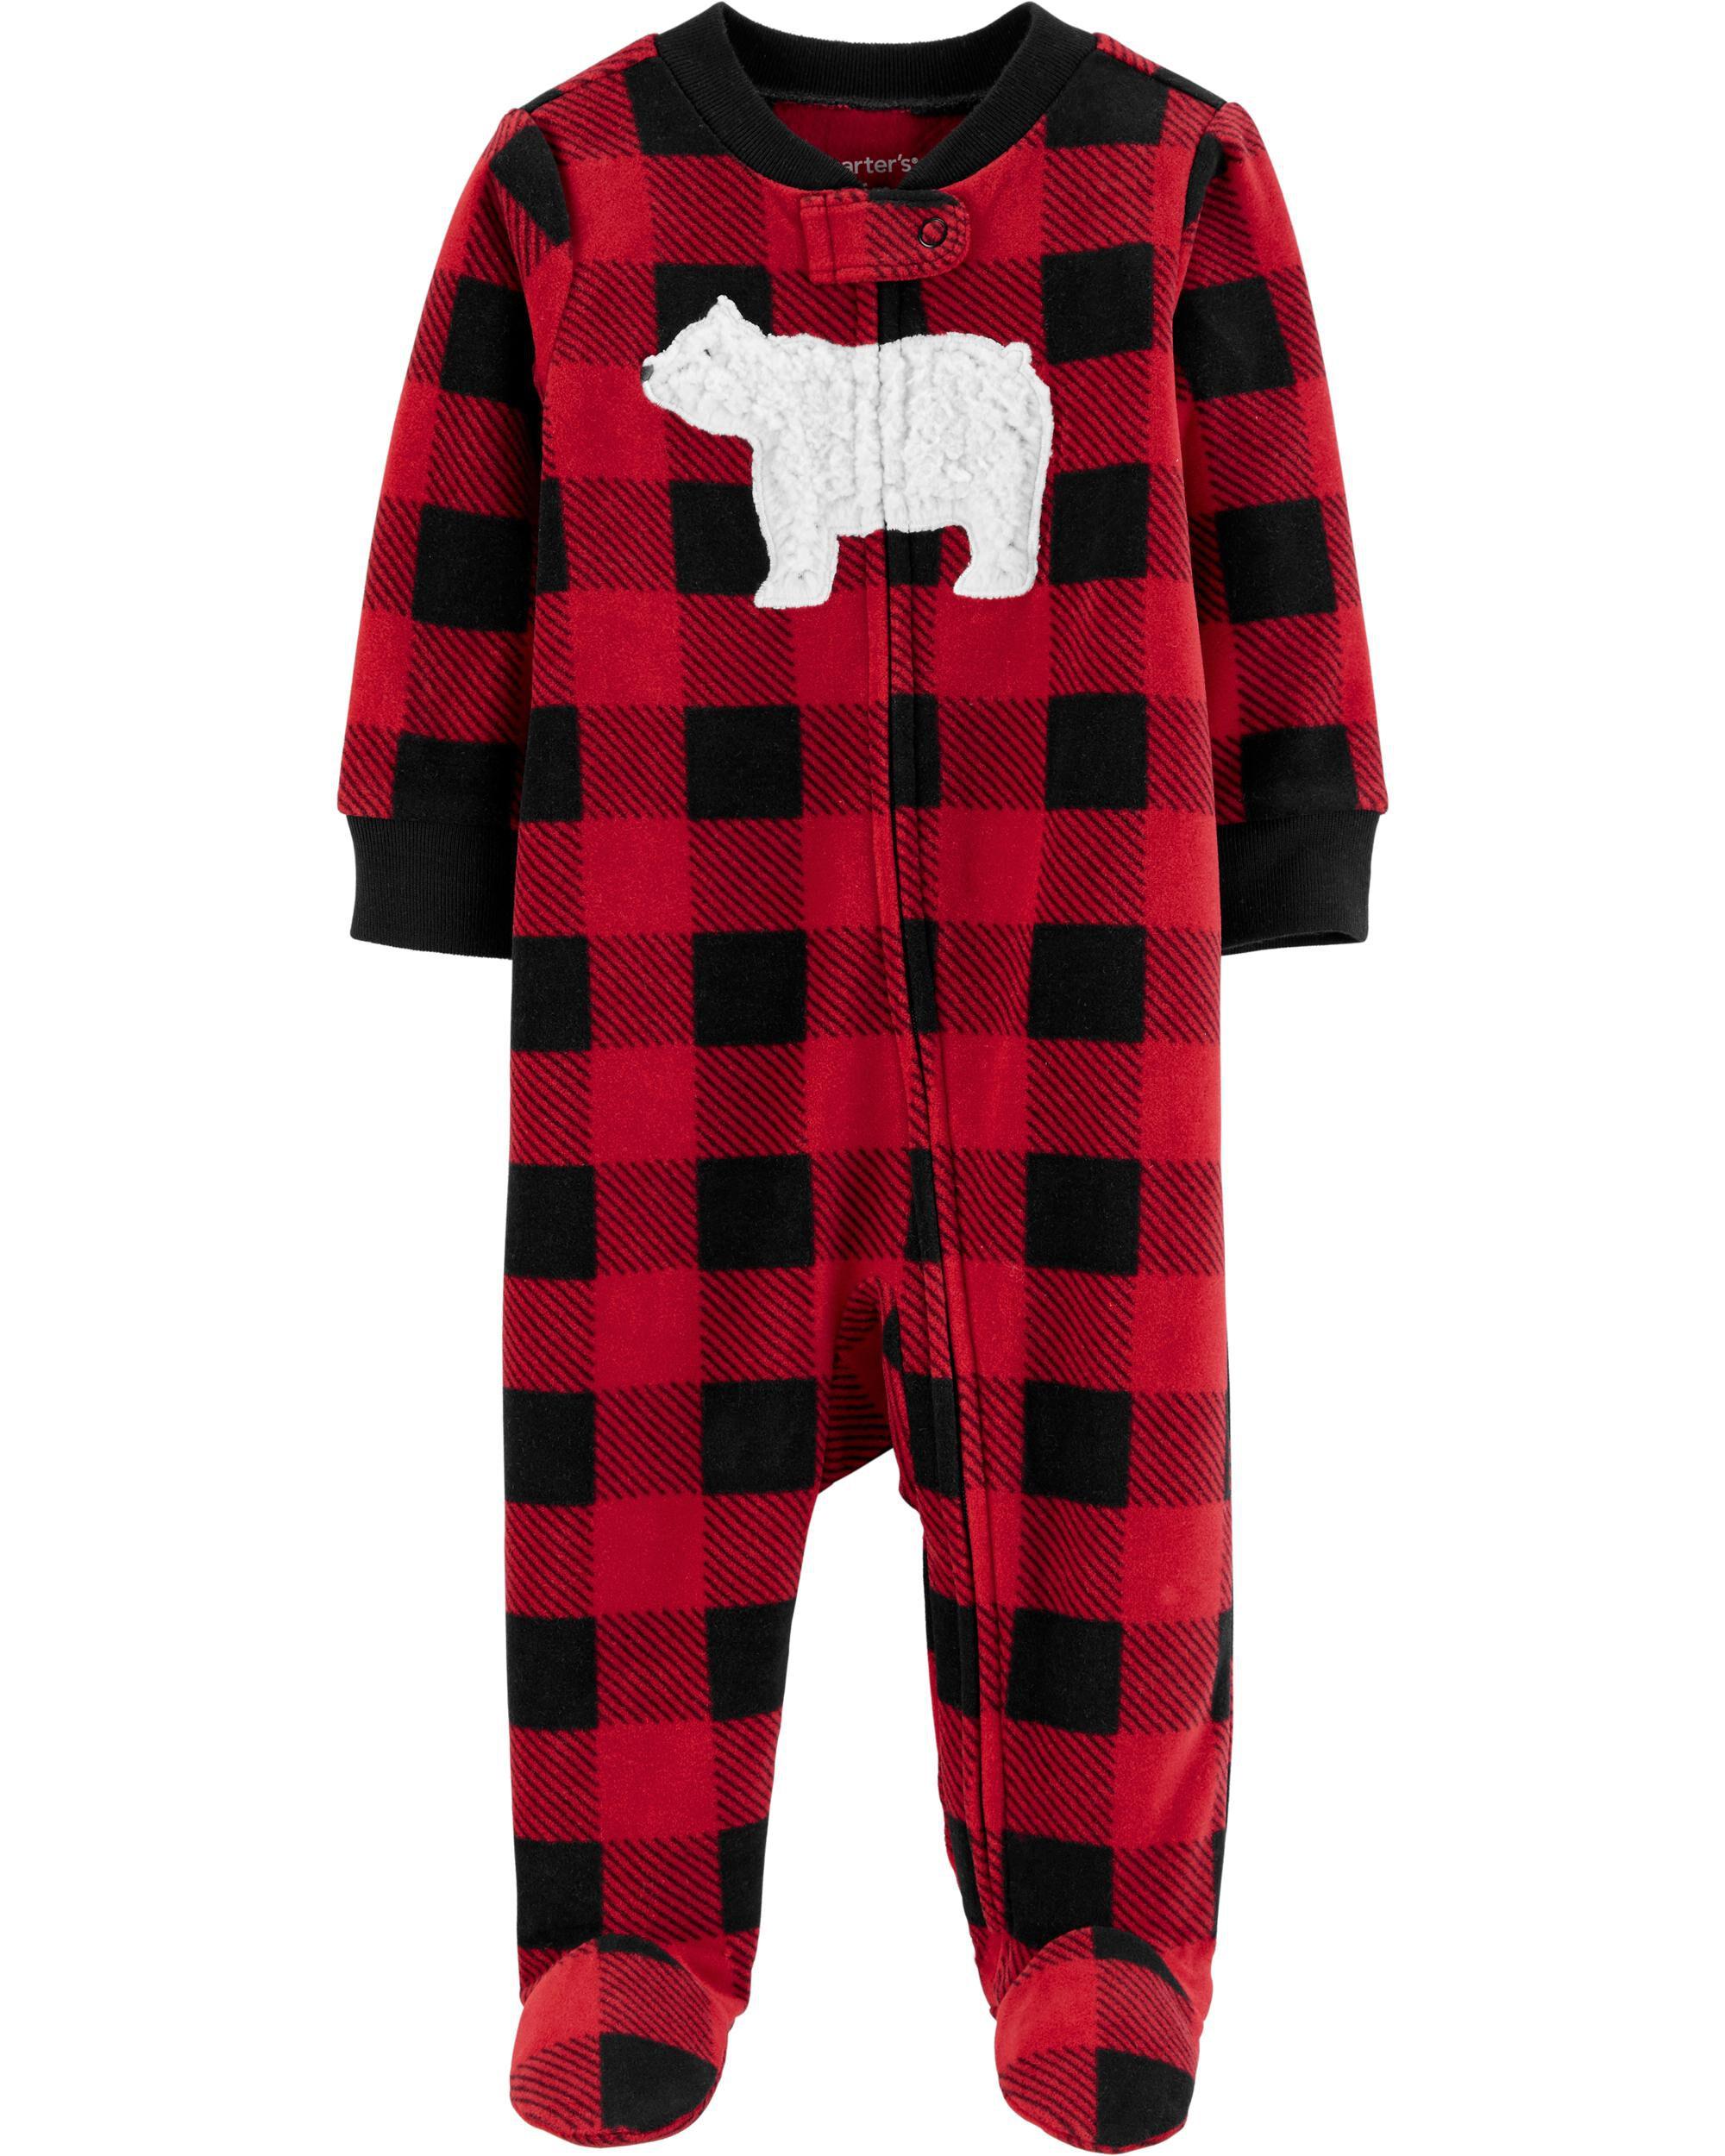 *DOORBUSTER* Buffalo Check Zip-Up Fleece Sleep & Play